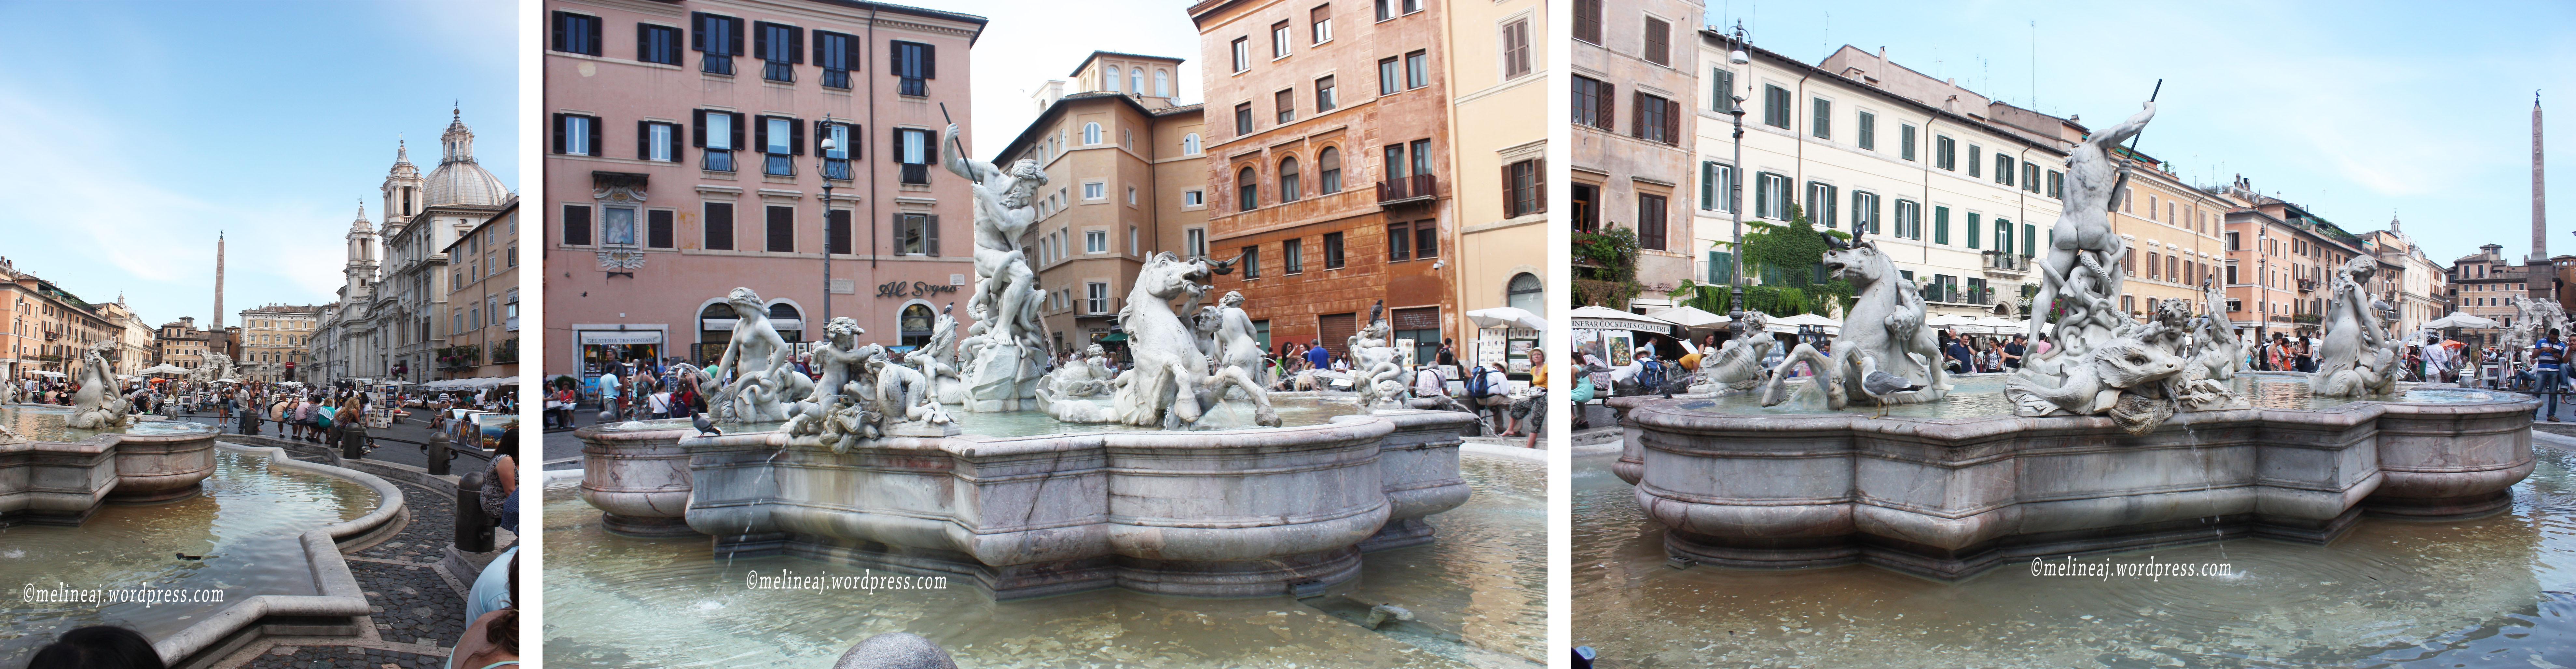 Rome Subway Map To Trevi Fountain Spanish Steps.Rome Day 7 Piazza Navona Il Vittoriano Trevi Fountain Spanish